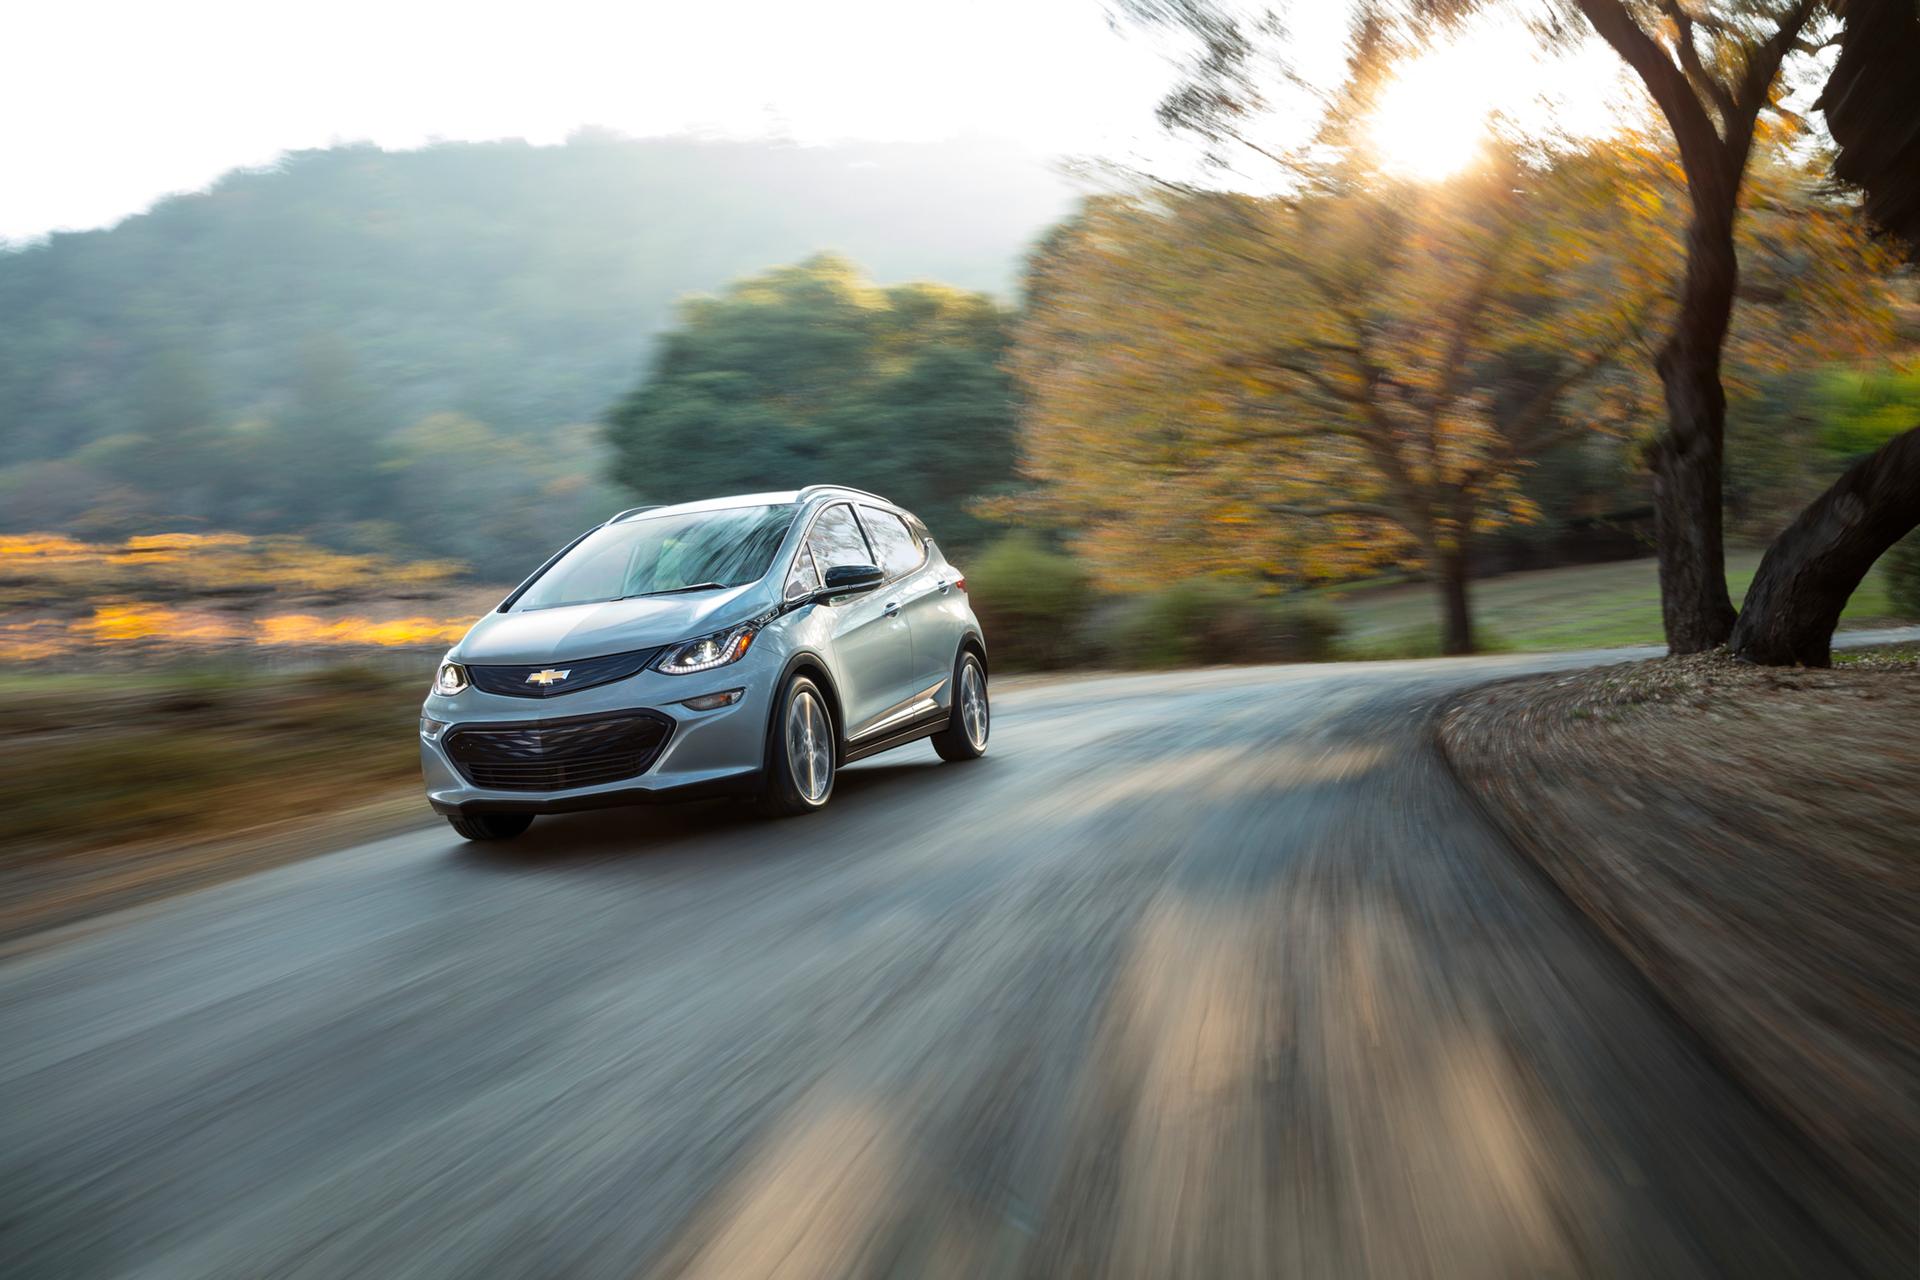 Chevrolet Bolt EV - 2016 - front side-face / profil avant - General Motors